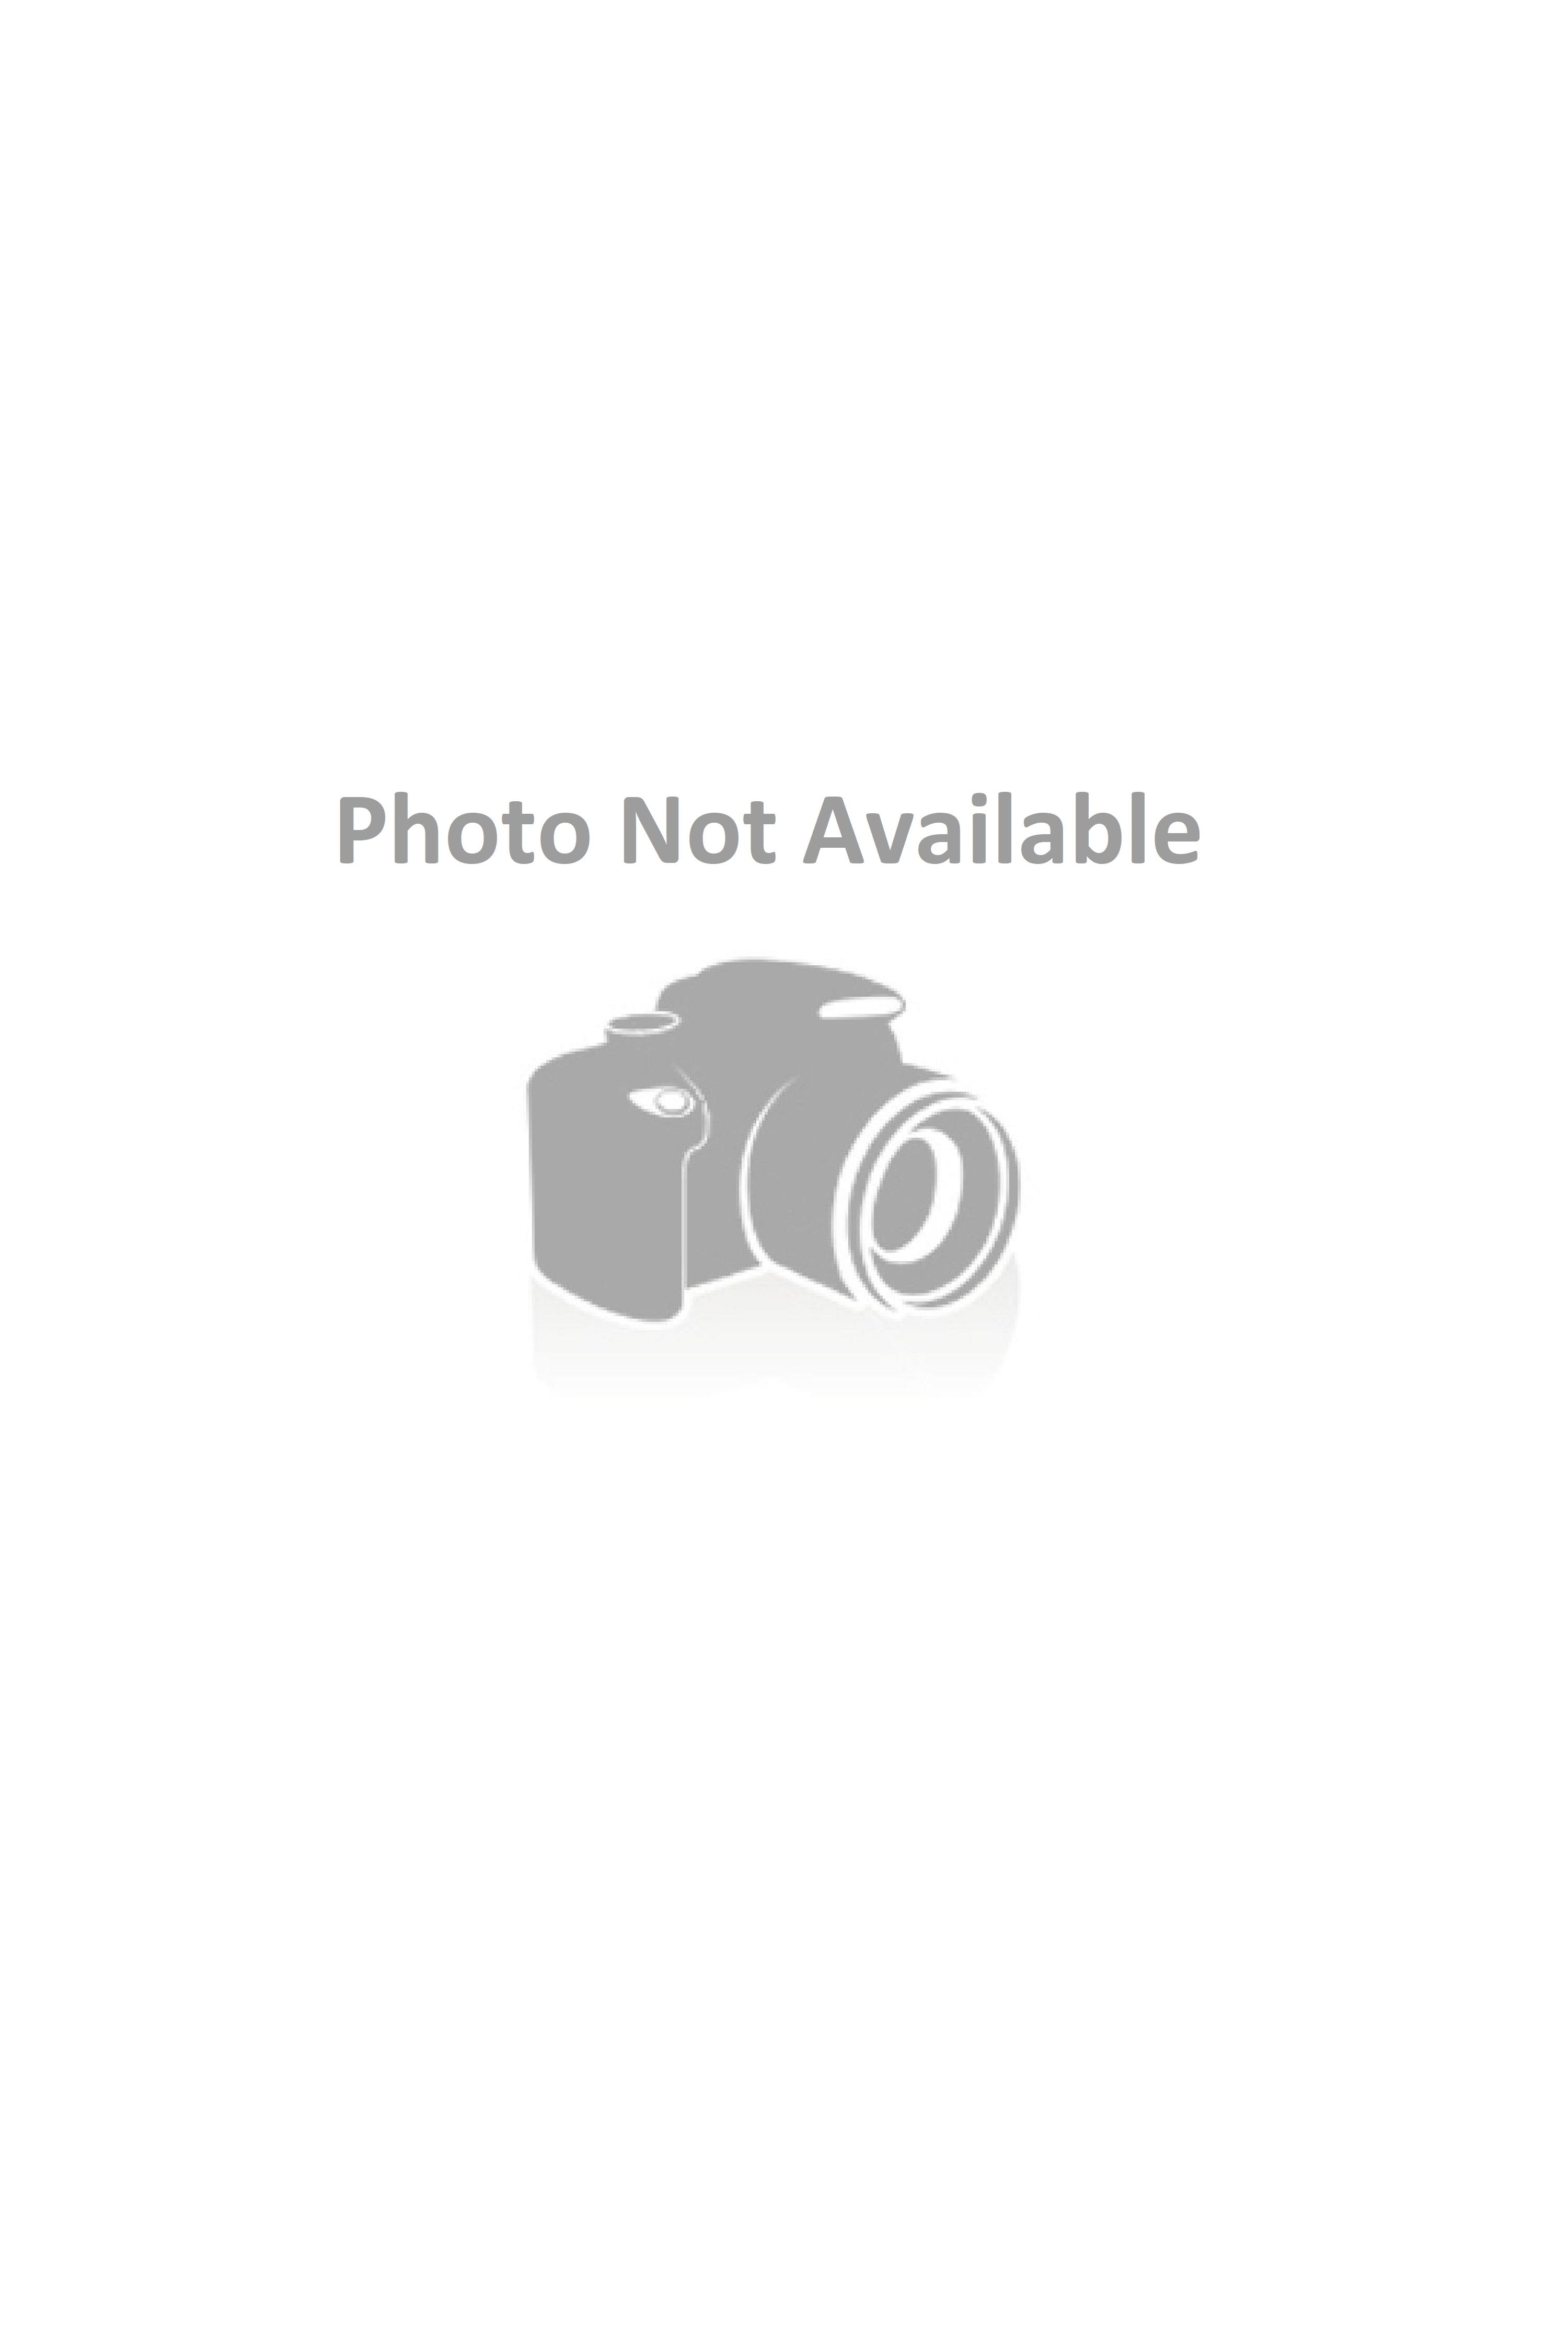 BLEND Herren Jet Jeans Hose Denim Dark Blue Slim Fit Style NEU 20703865